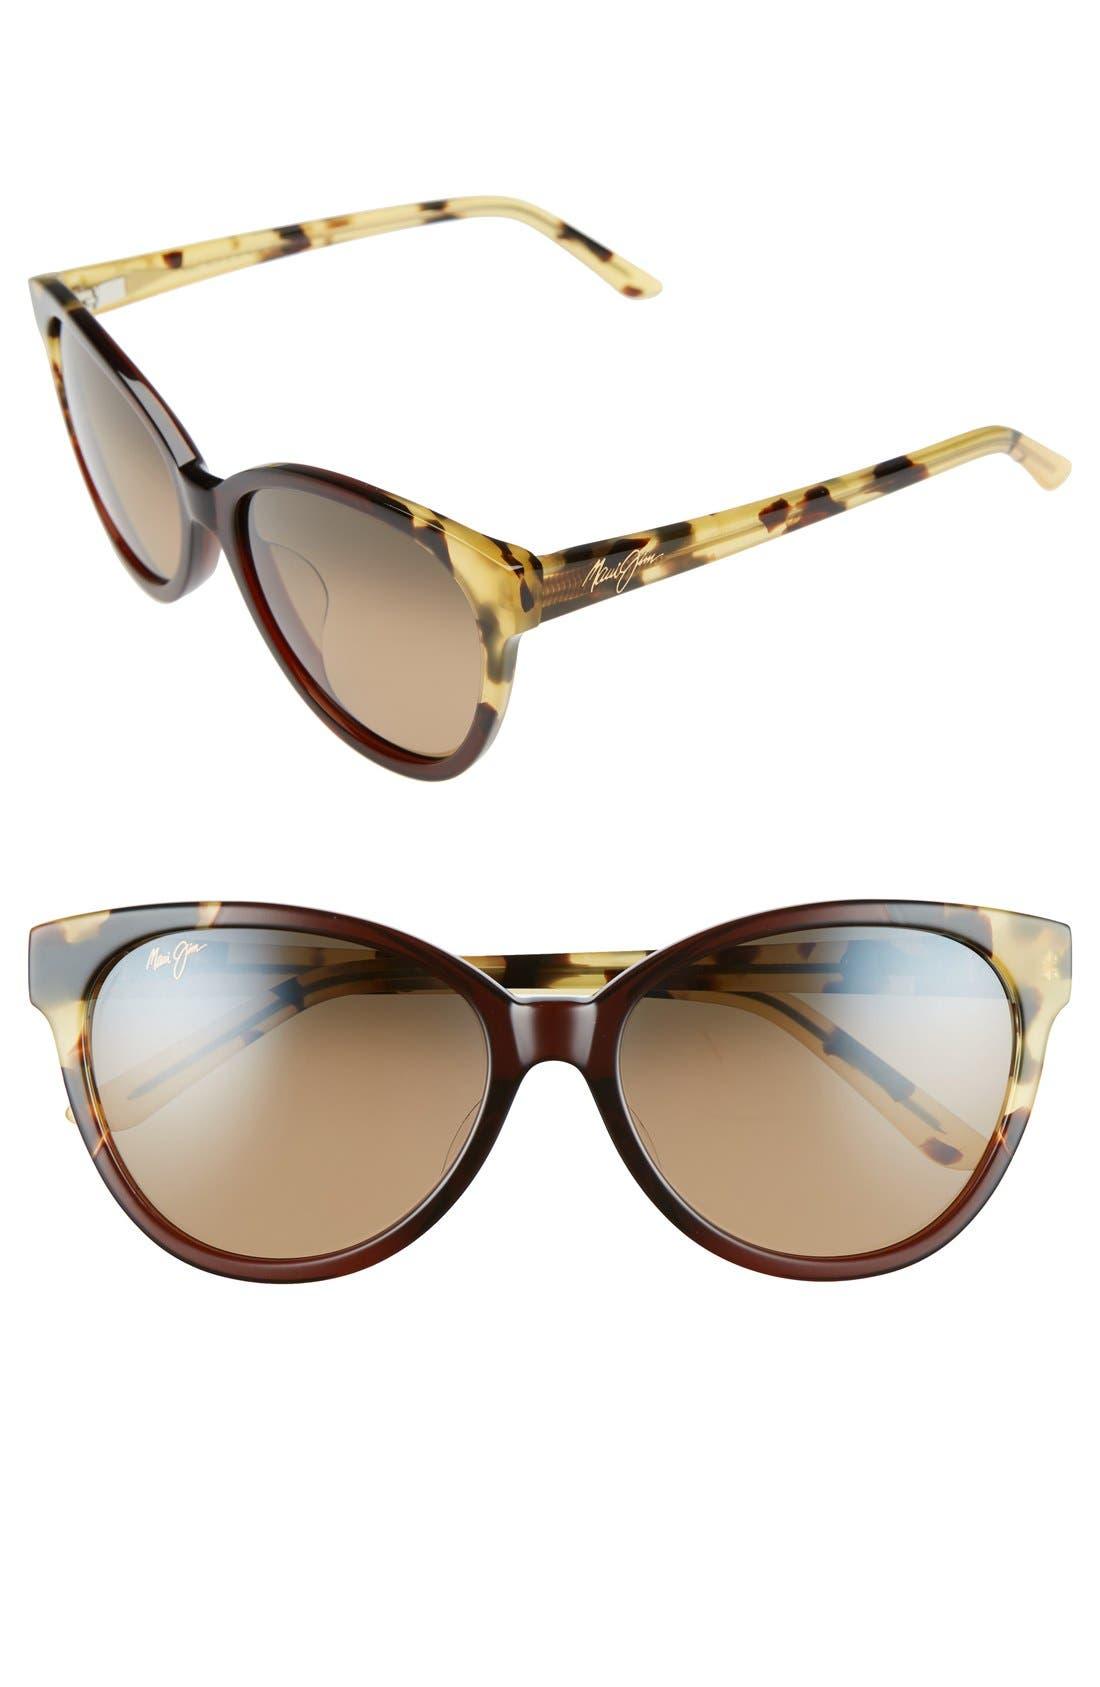 Sunshine 56mm PolarizedPlus2<sup>®</sup> Sunglasses,                             Main thumbnail 1, color,                             MARSALA TOKYO TORTOISE/ BRONZE